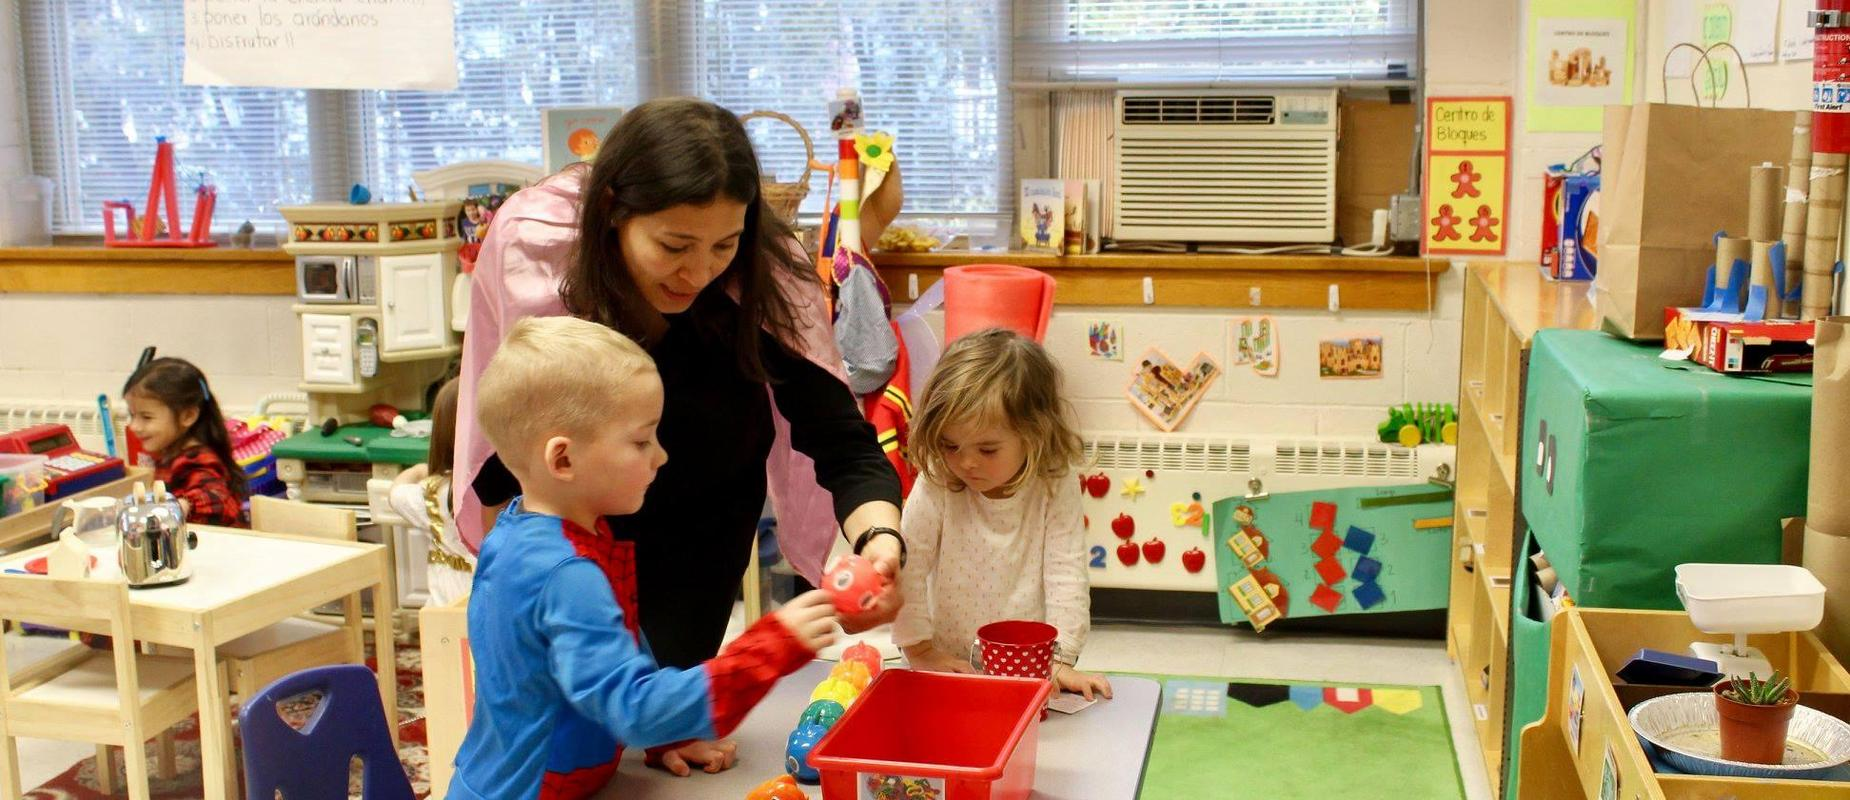 Little Children Doing Fun Classroom Activities